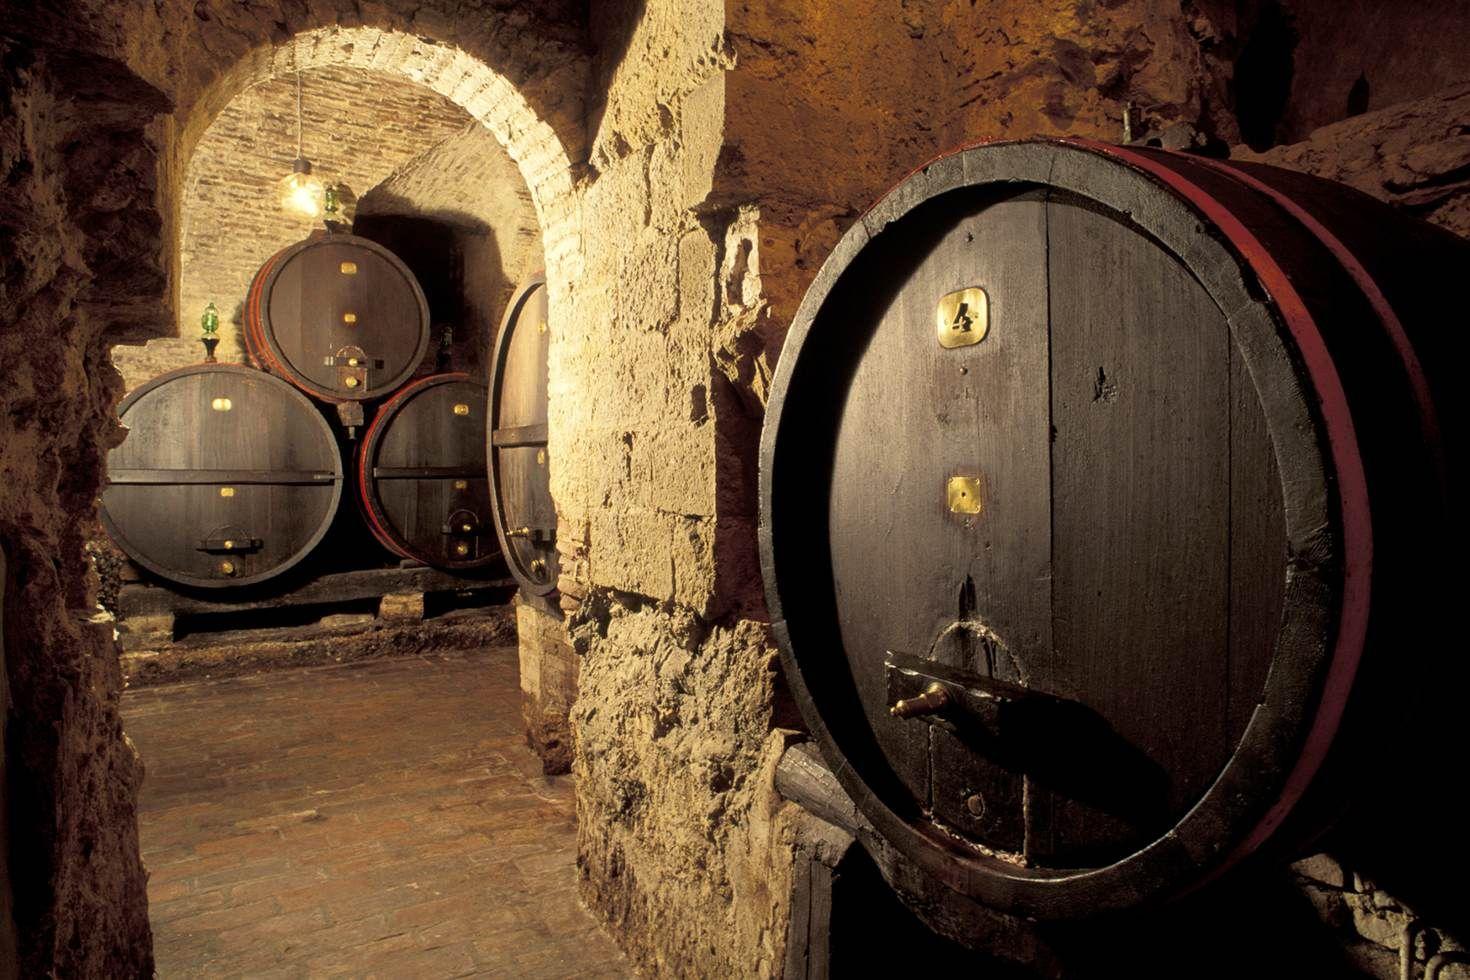 An atmospheric wine cellar in Montepulciano